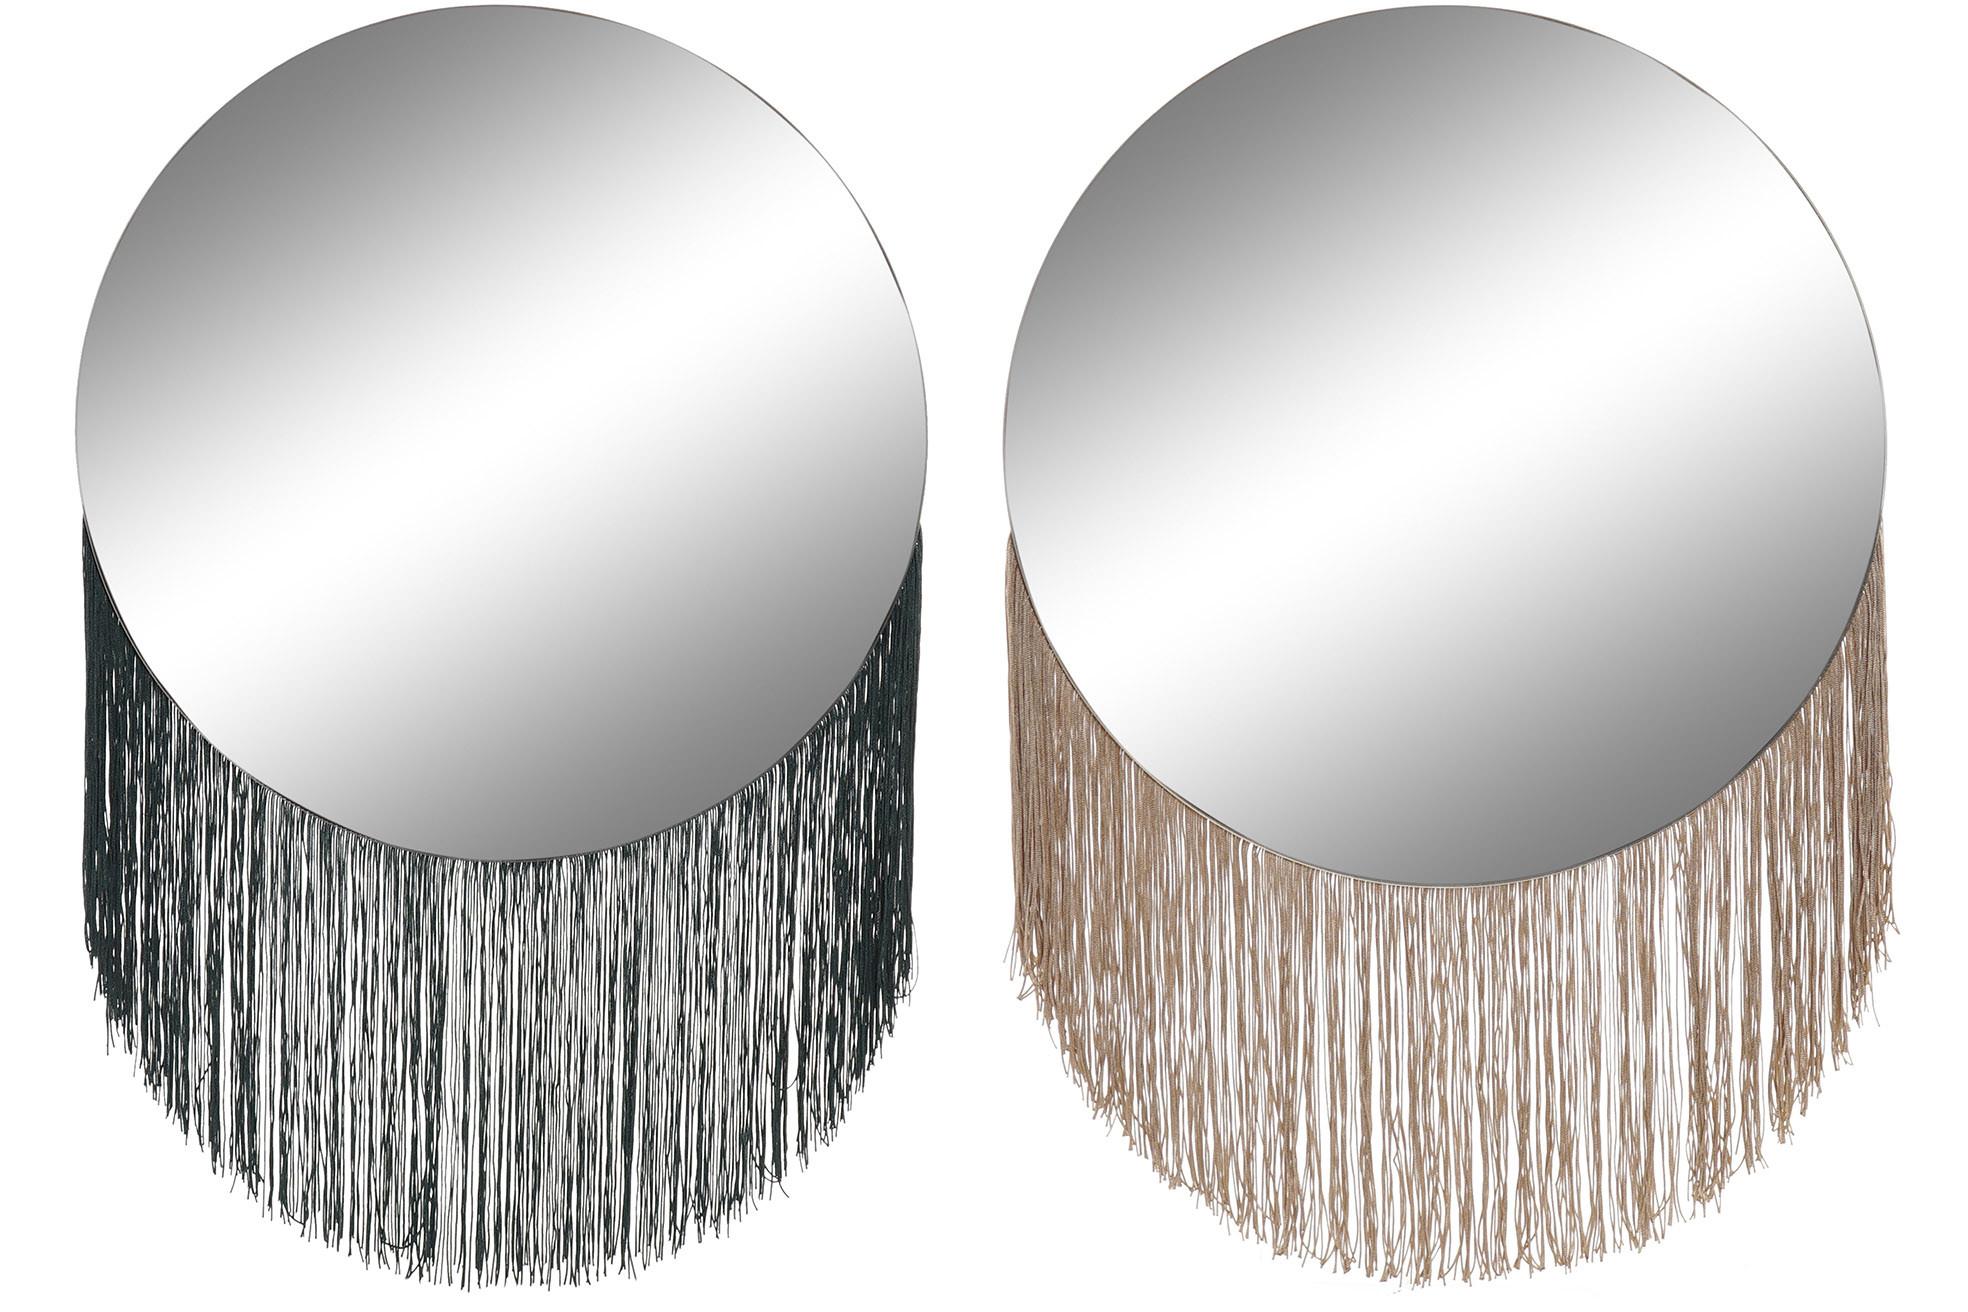 Espejo Circular con Flecos Pared, Espejo Pared Decorativo para Dormitorio. Decoración Moderna Hogar 40x58 cm